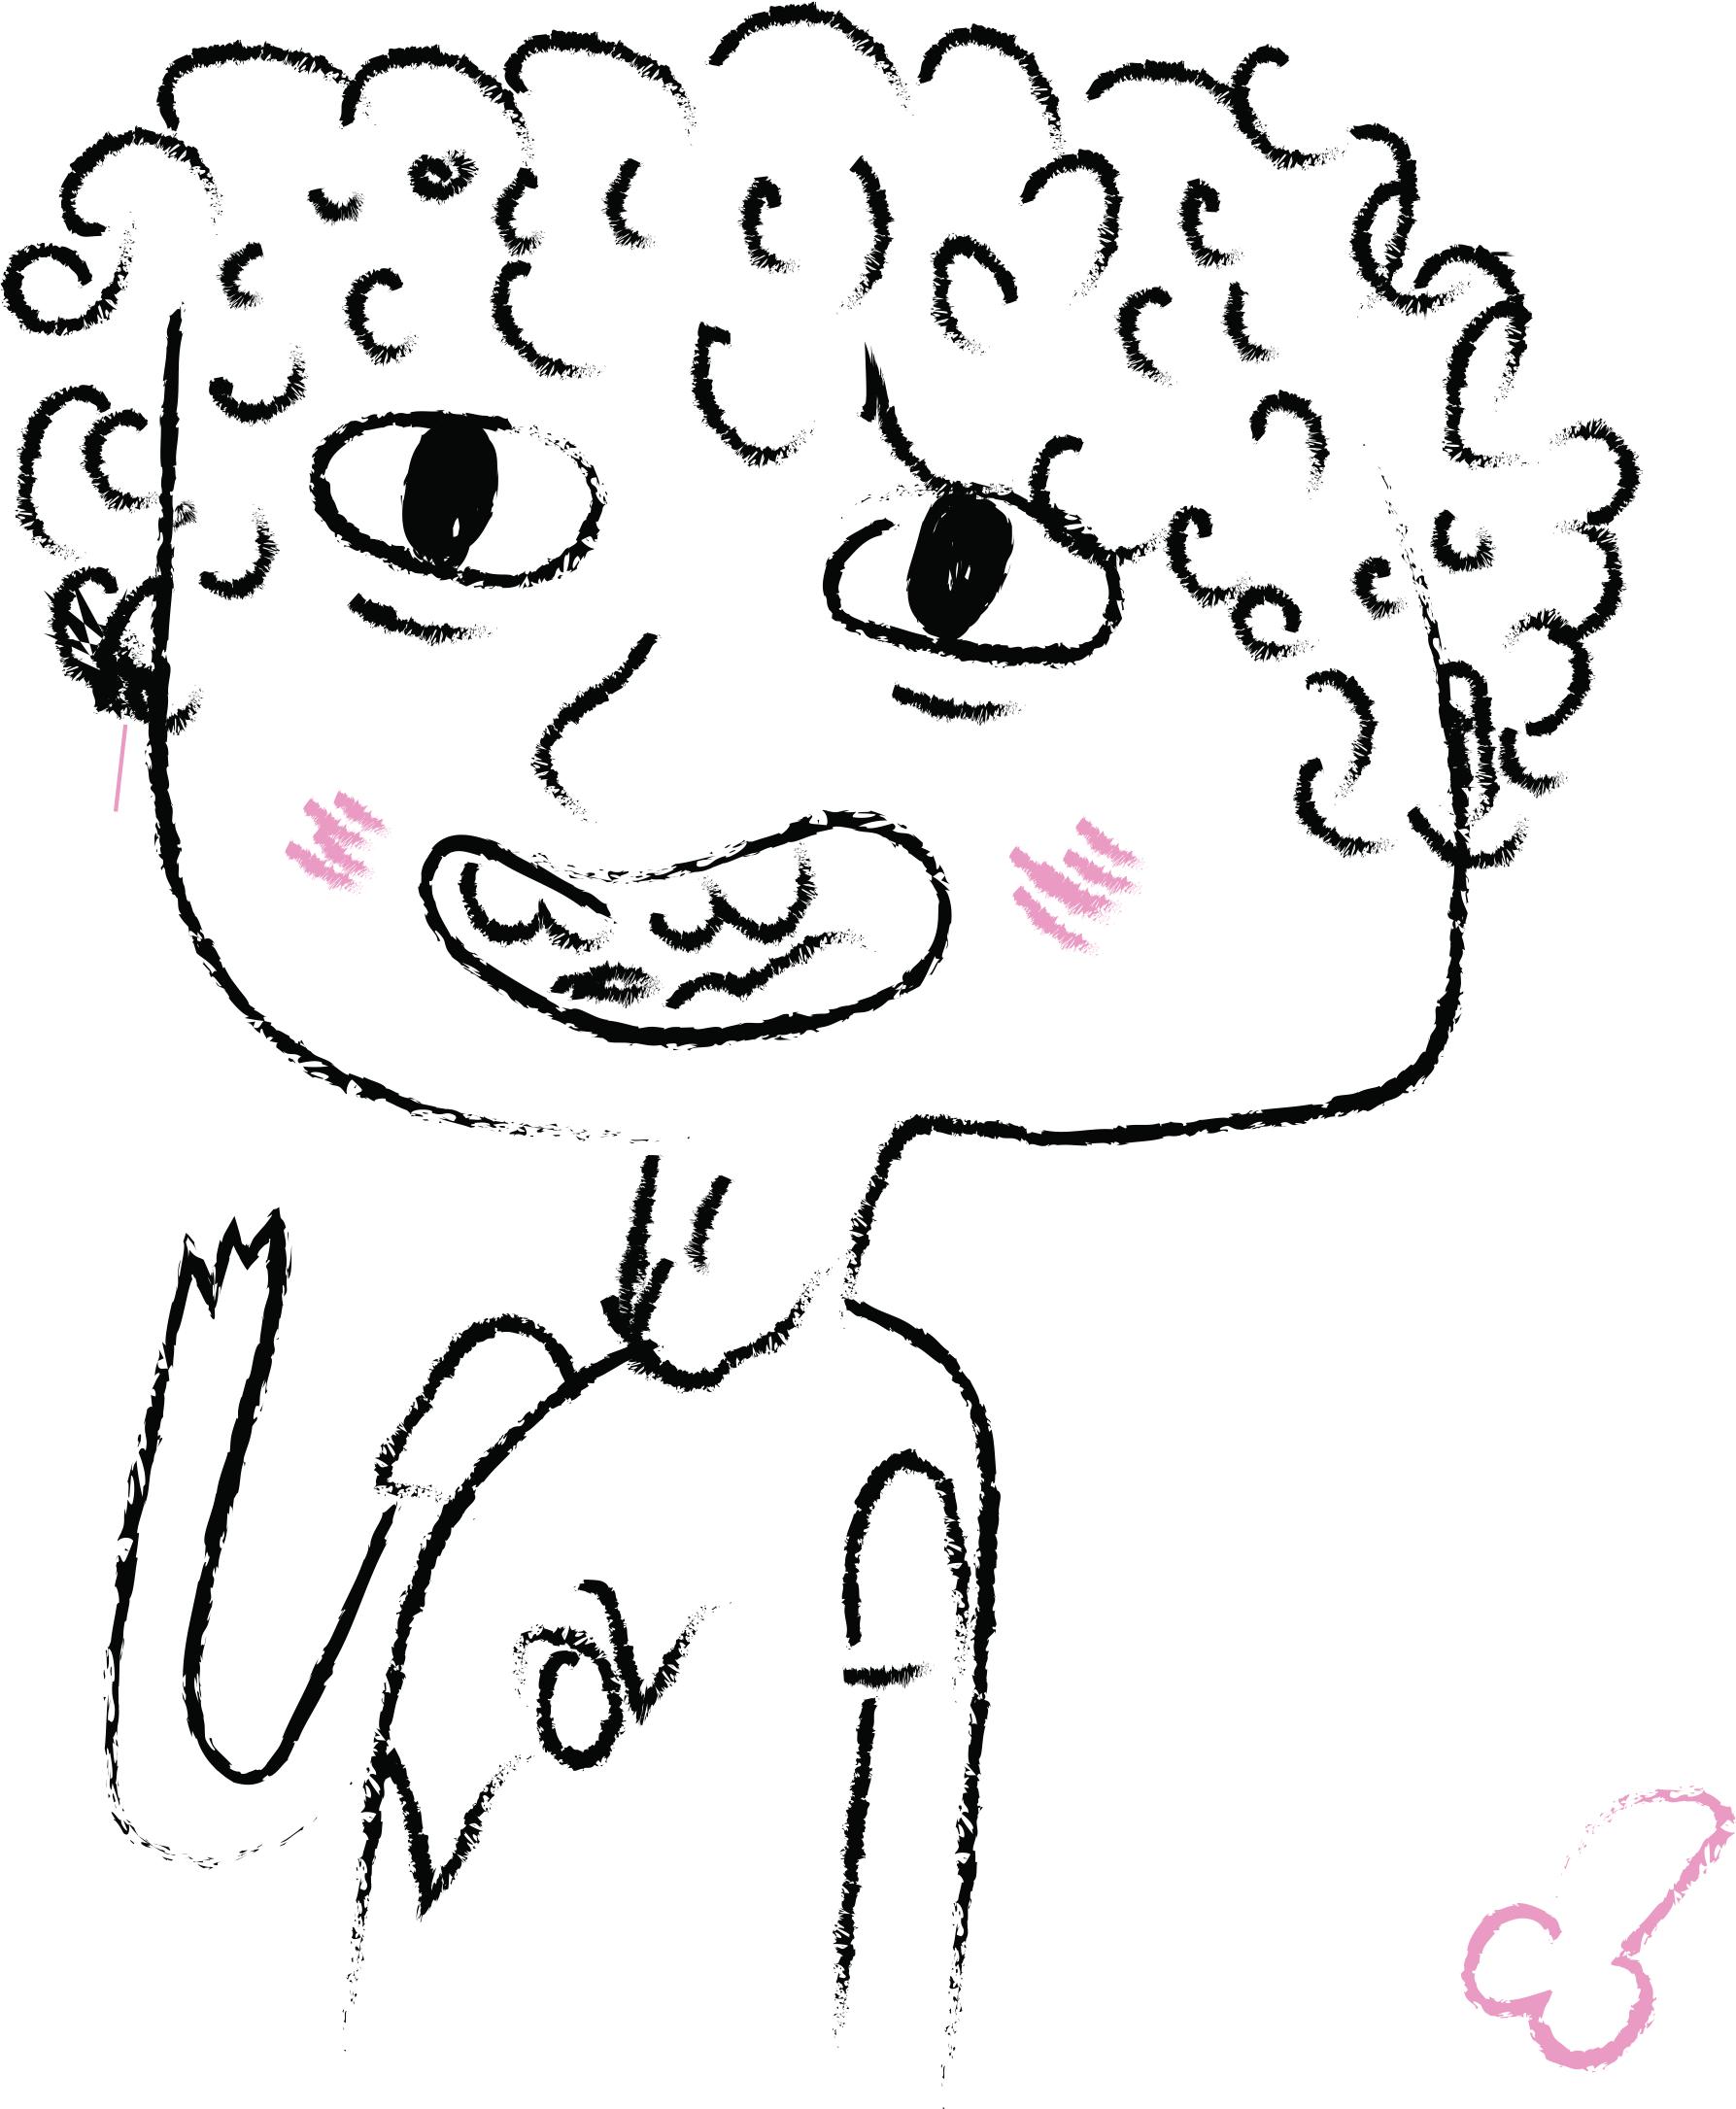 my portrait